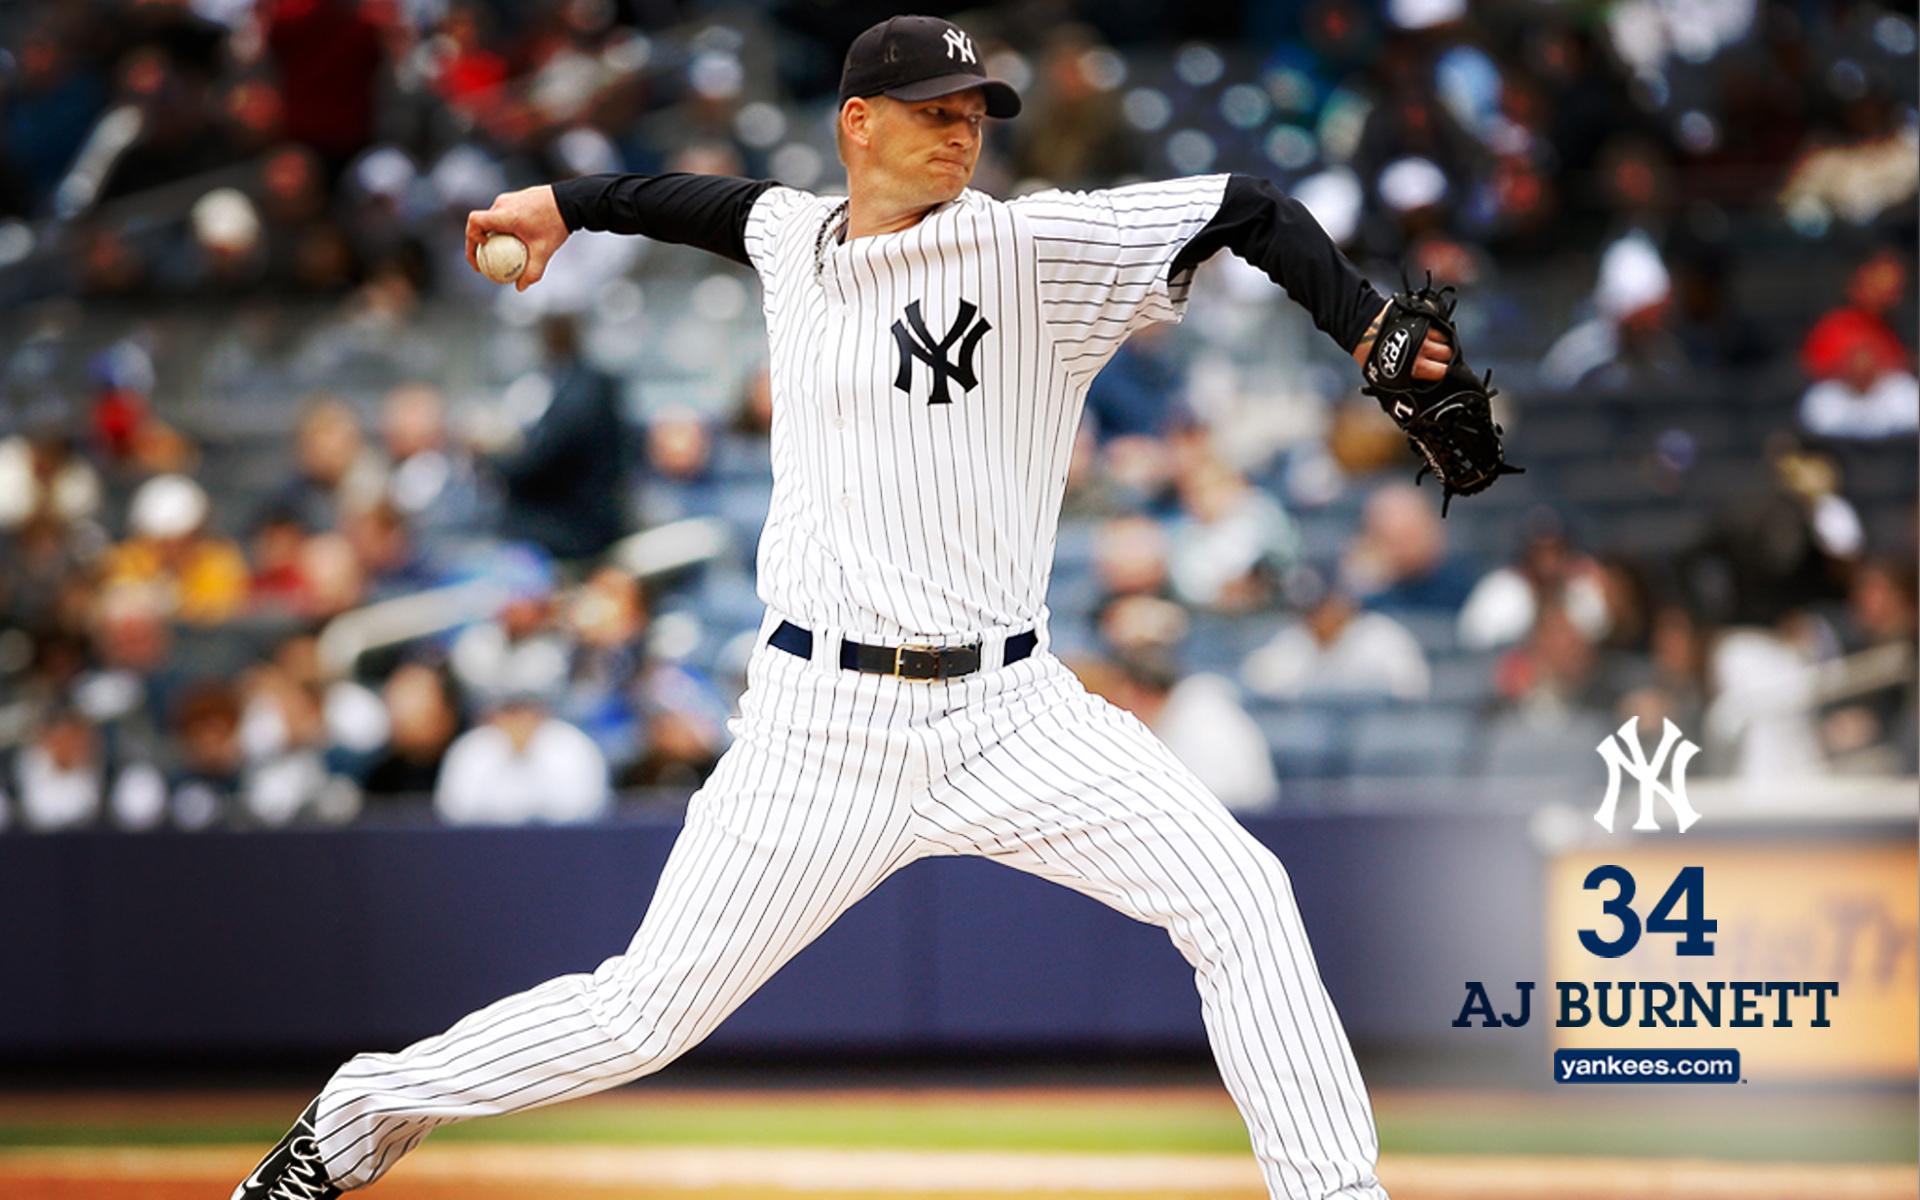 NEW YORK YANKEES Baseball Mlb Hc Wallpaper